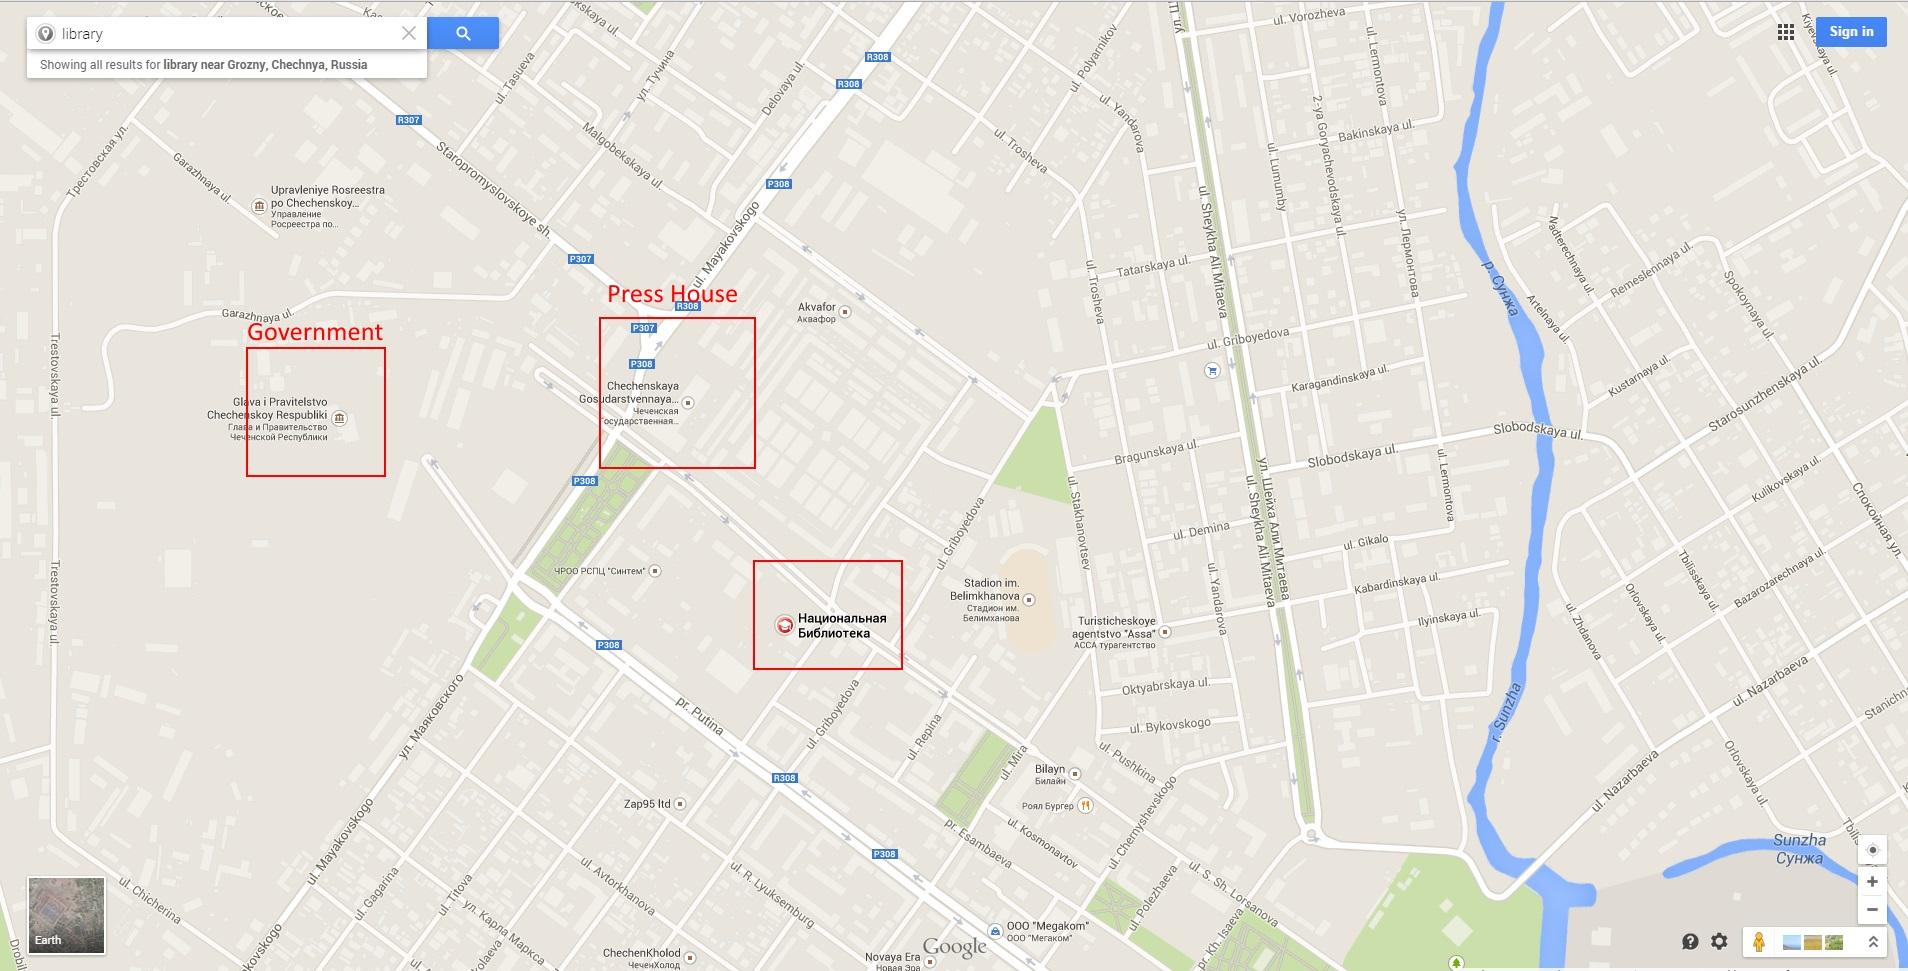 Grozny-Events.jpg